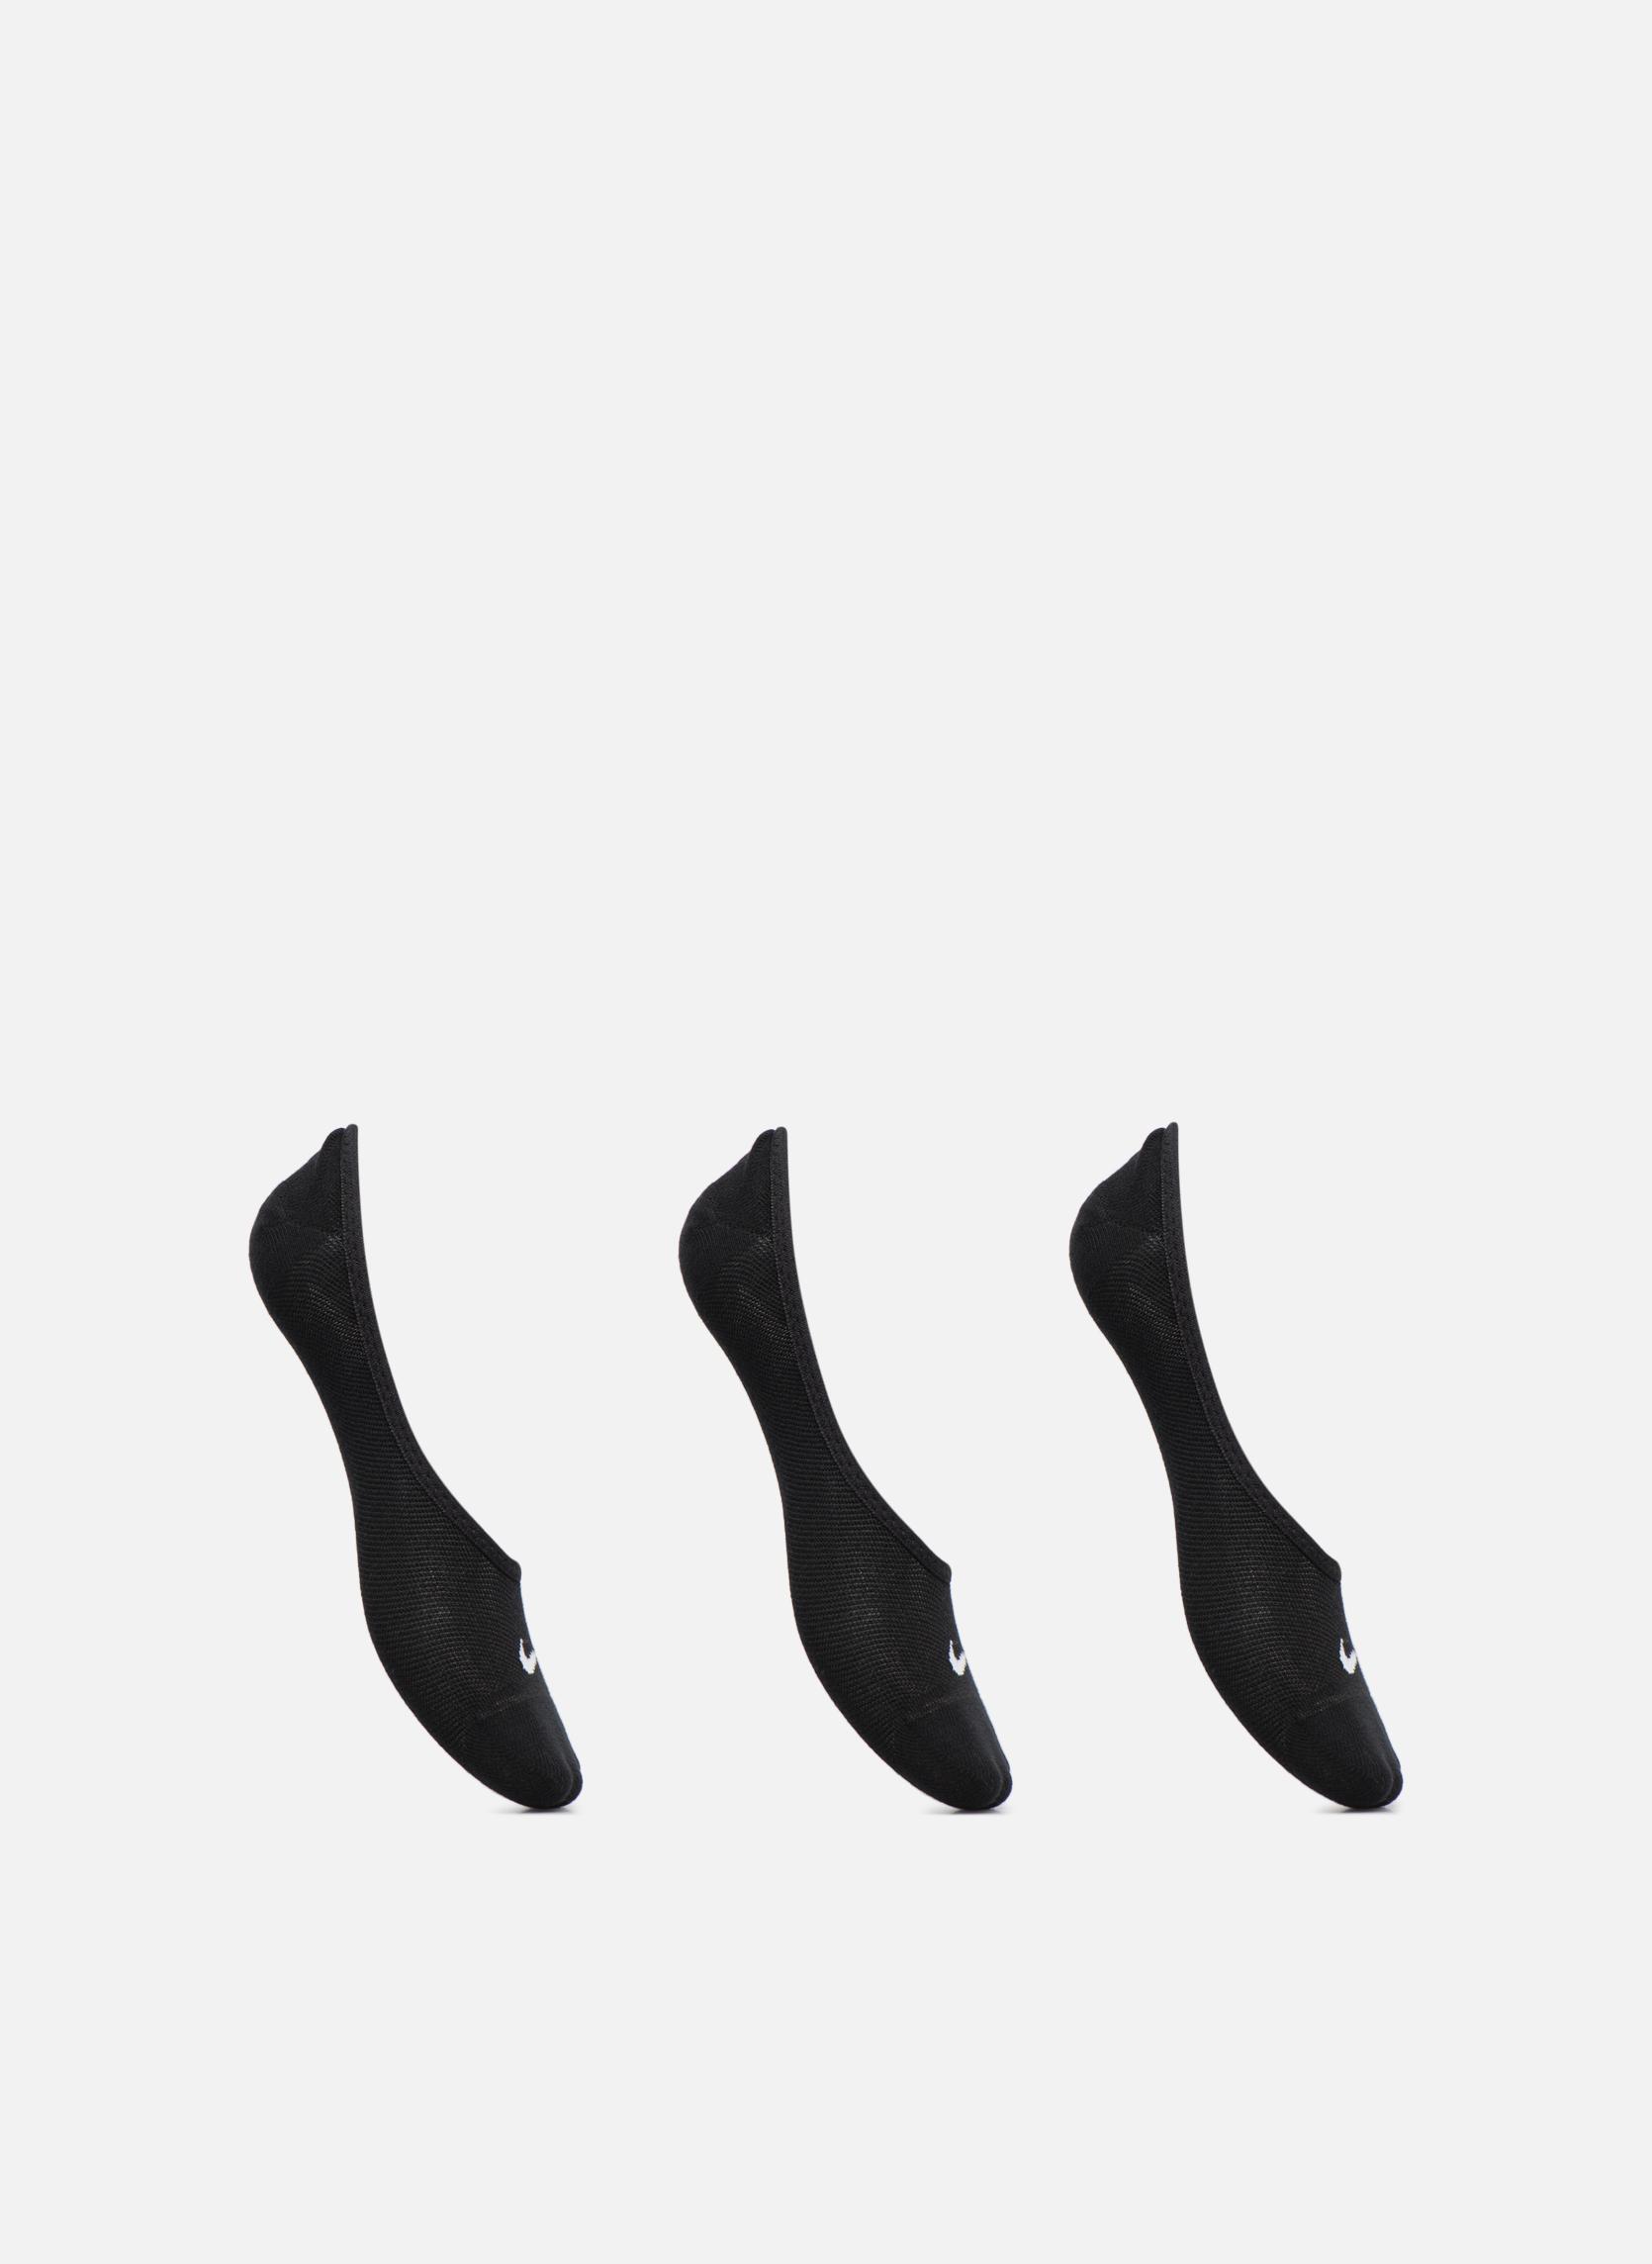 Socken & Strumpfhosen Nike Sportsocken 3PPK WOMEN S LIGHTWEIGHT FOOTI 3er-Pack schwarz detaillierte ansicht/modell